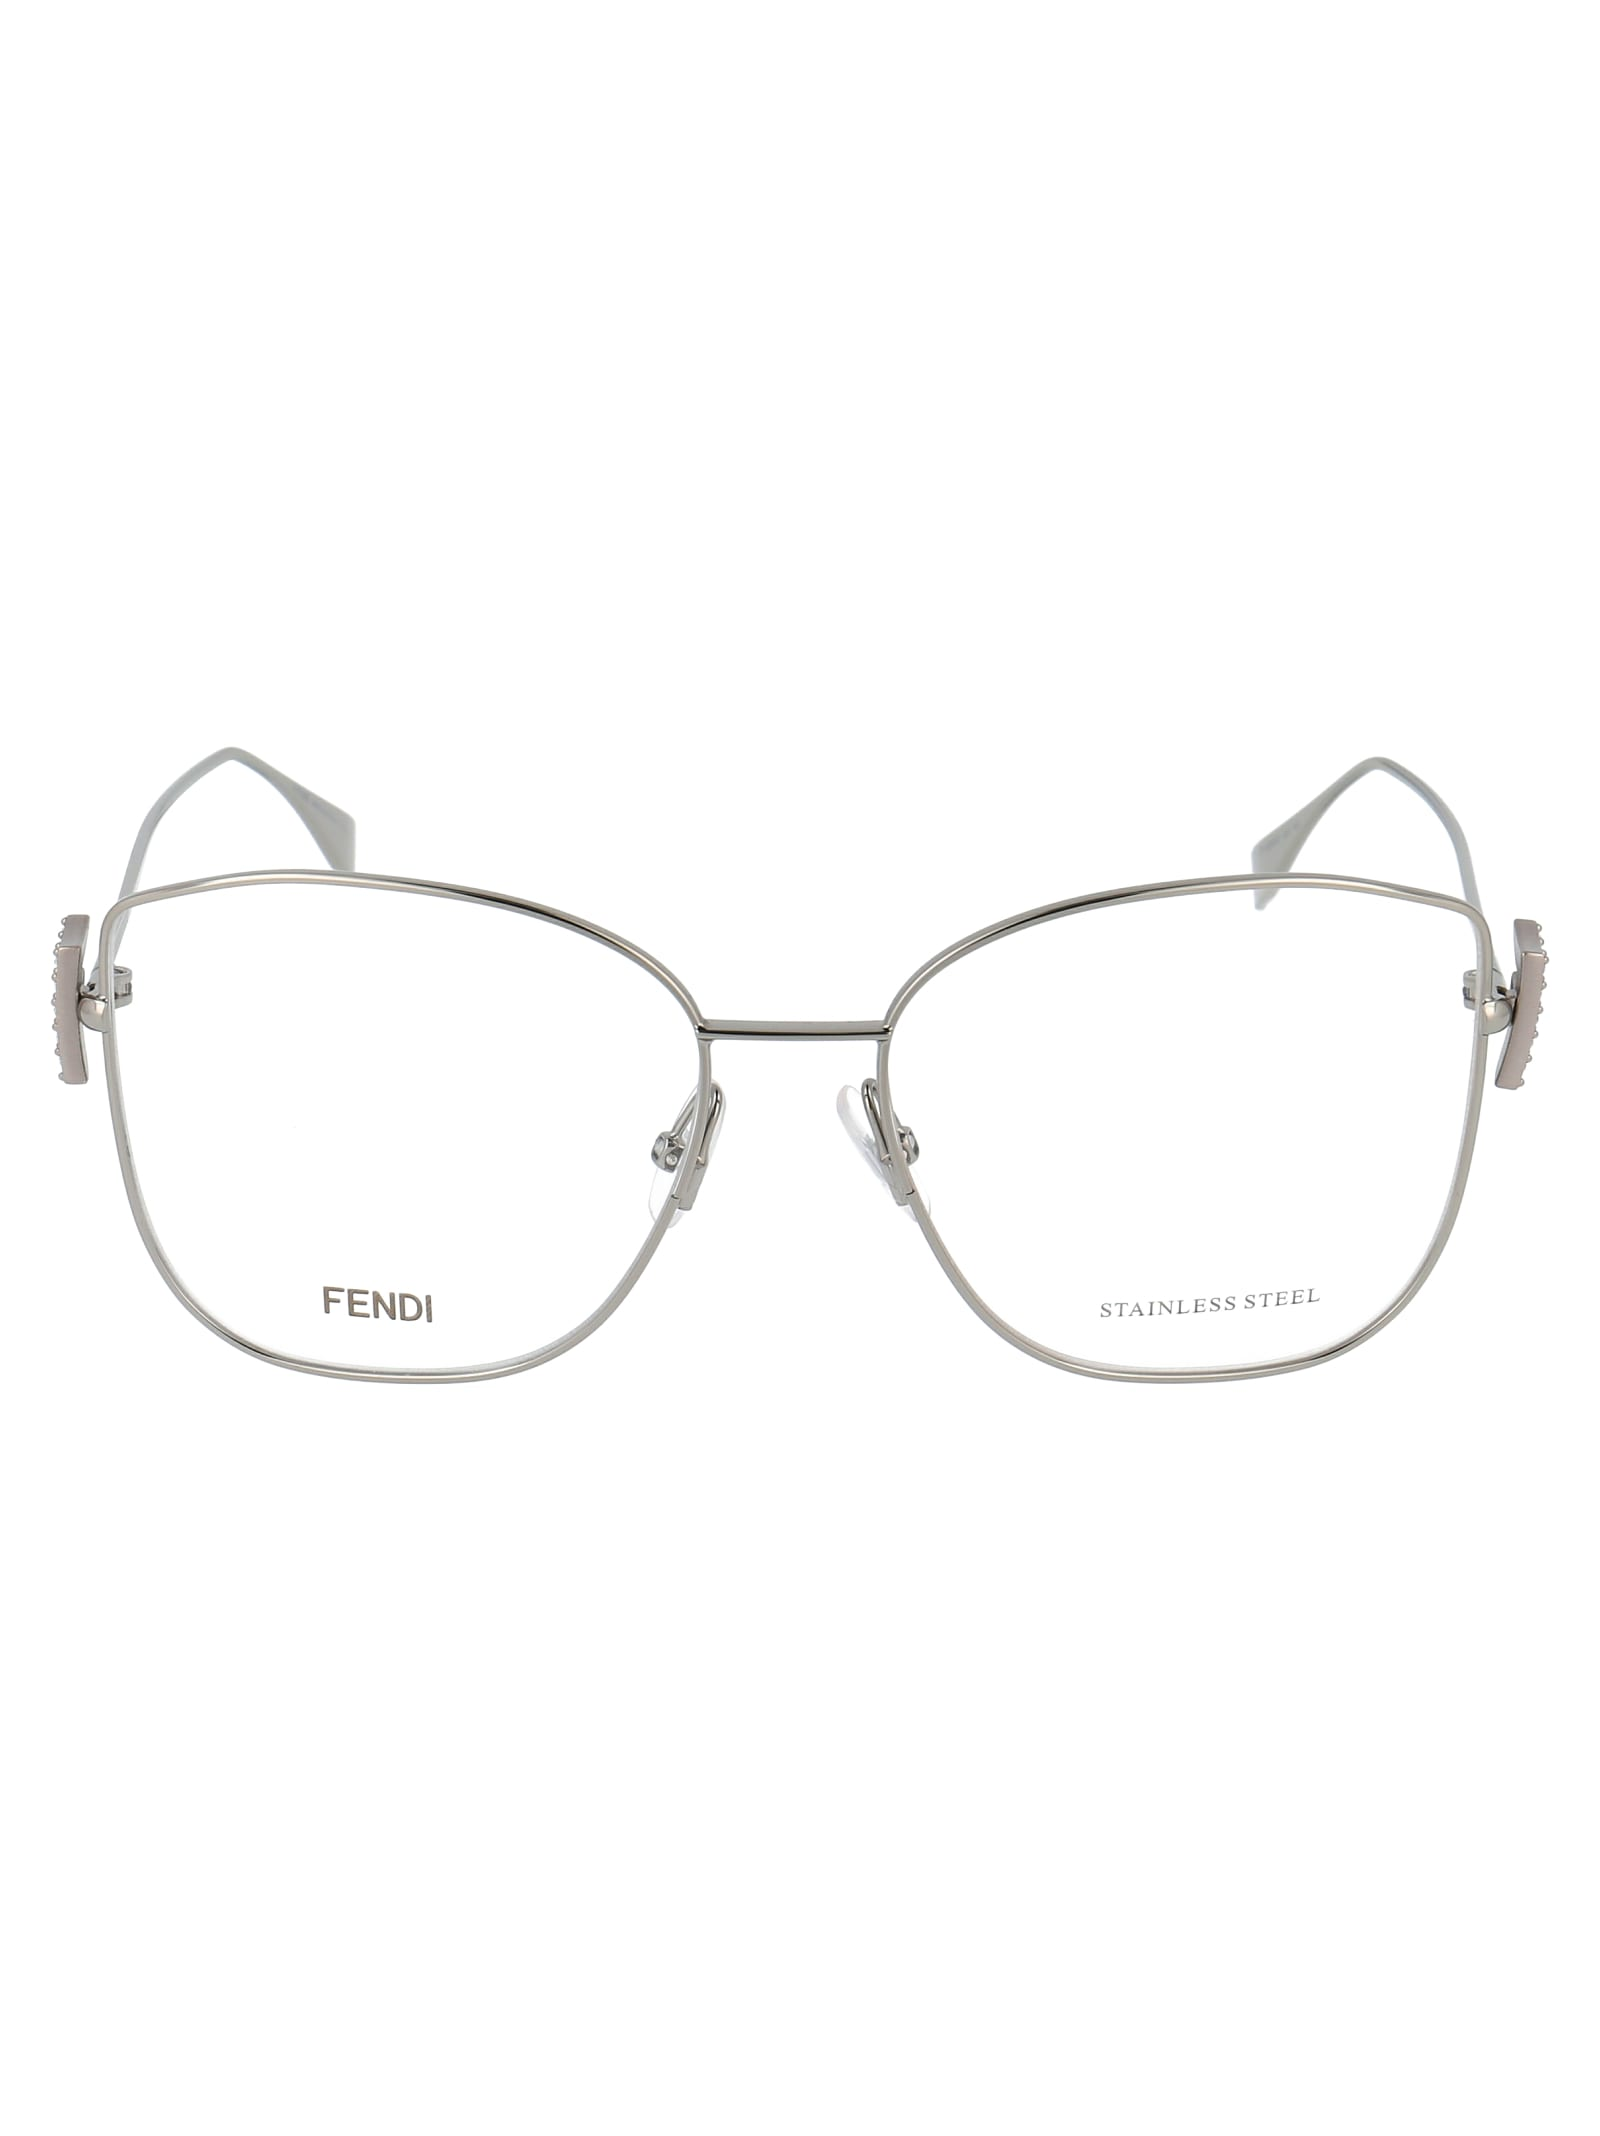 Ff 0390/g Glasses